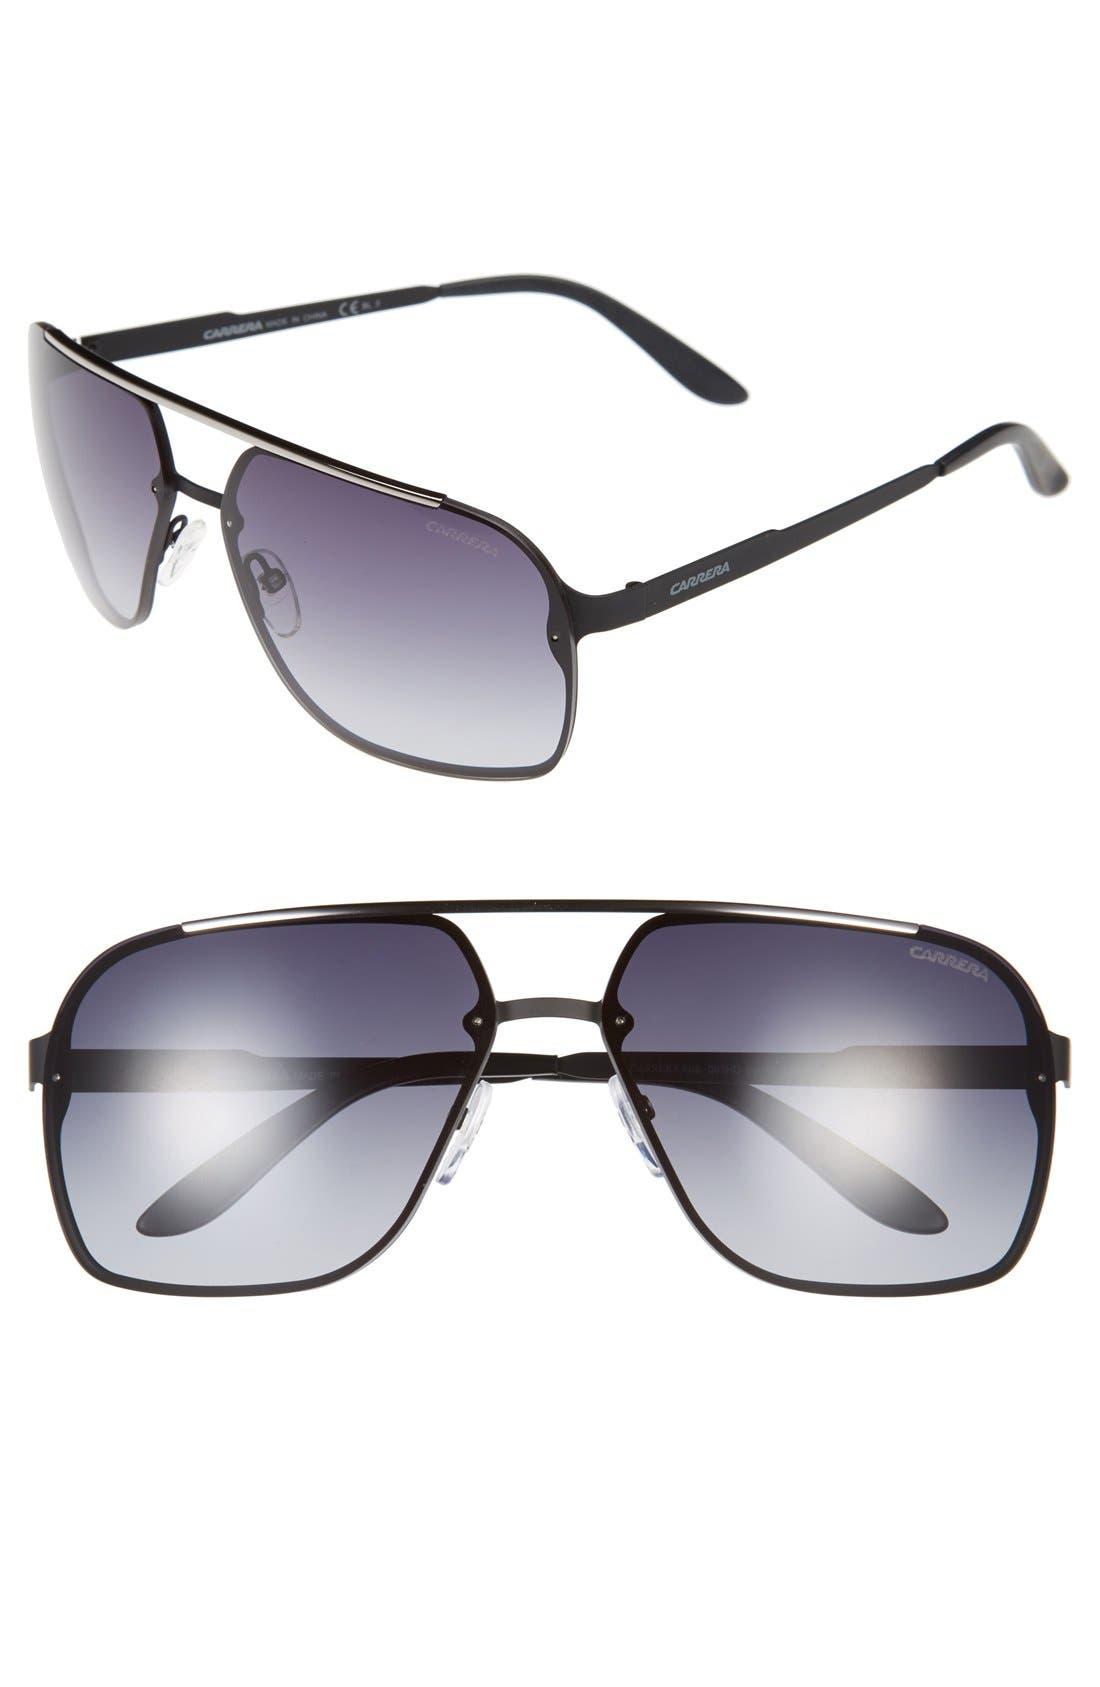 64mm Navigator Sunglasses,                             Main thumbnail 1, color,                             MATTE BLACK/ GREY GRADIENT